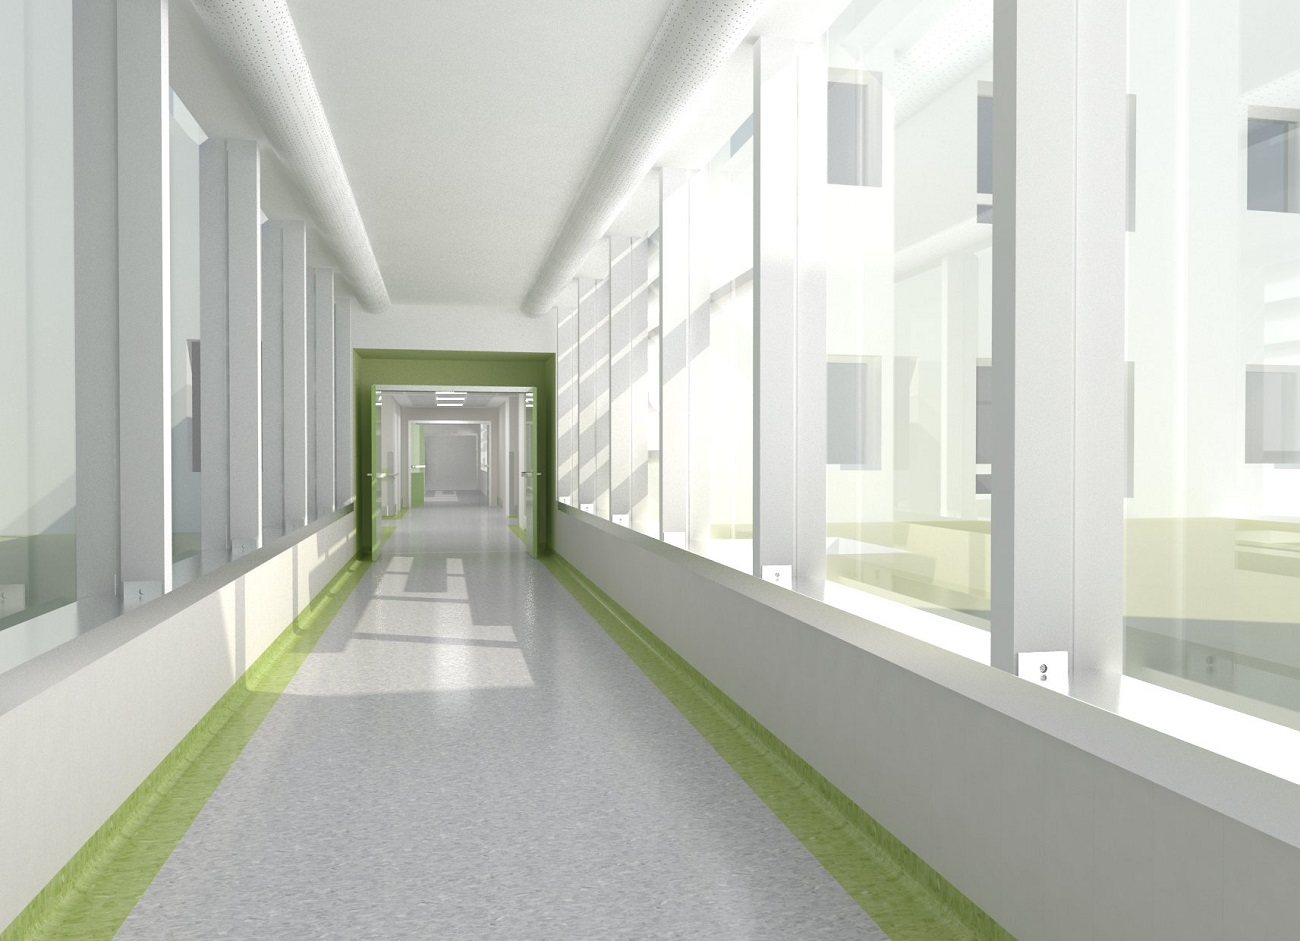 02-Corridor_AIACEsrl